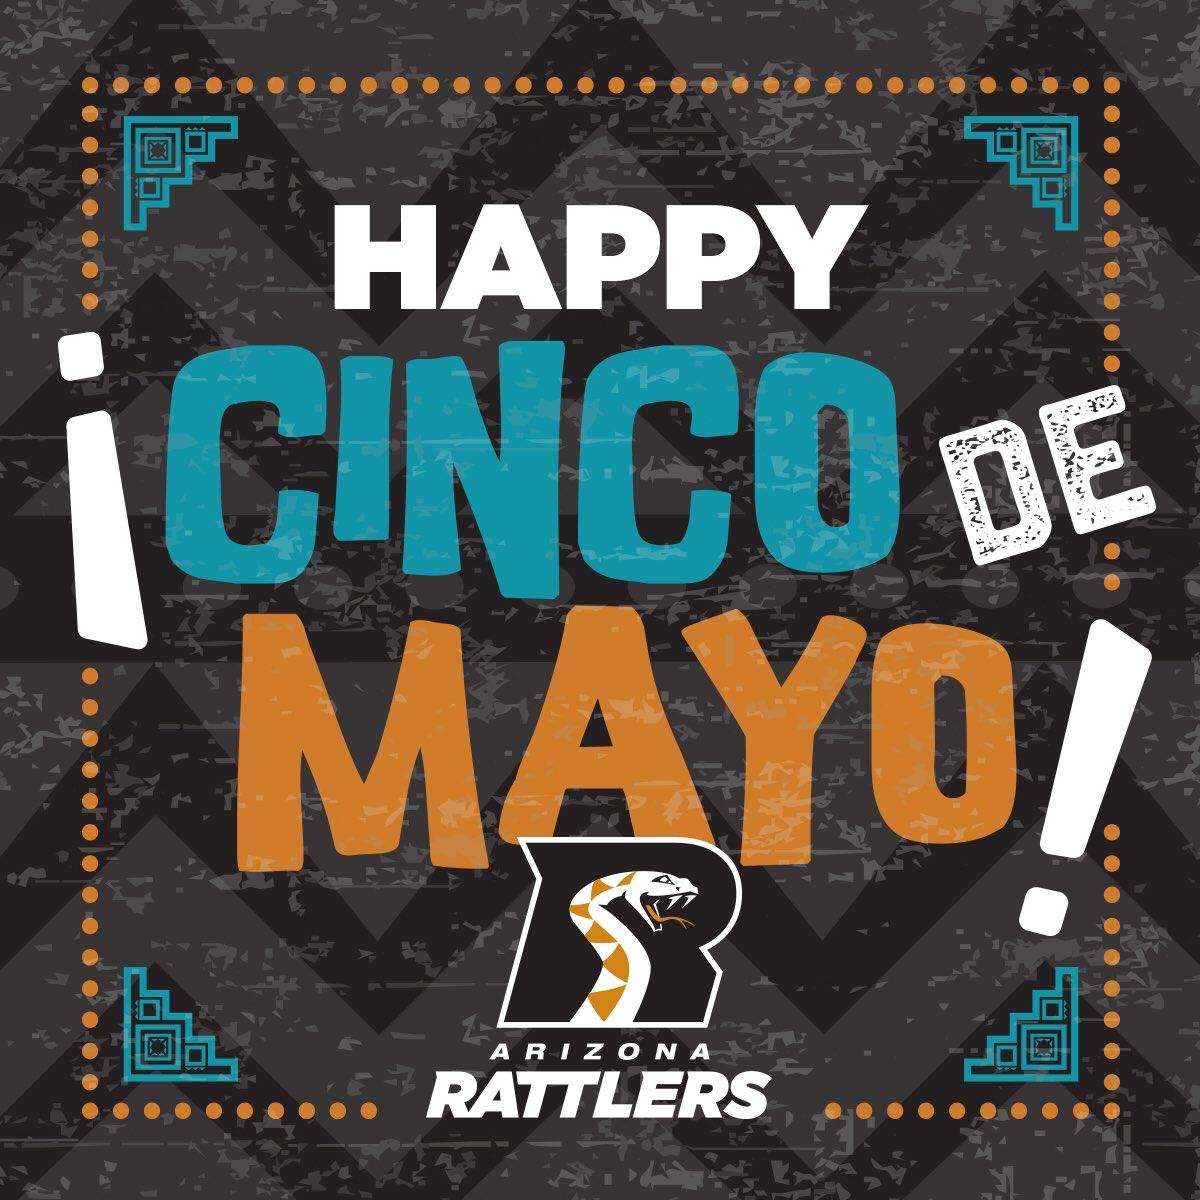 Happy #CincoDeMayo Rattler Nation! https://t.co/MYbT6auir4